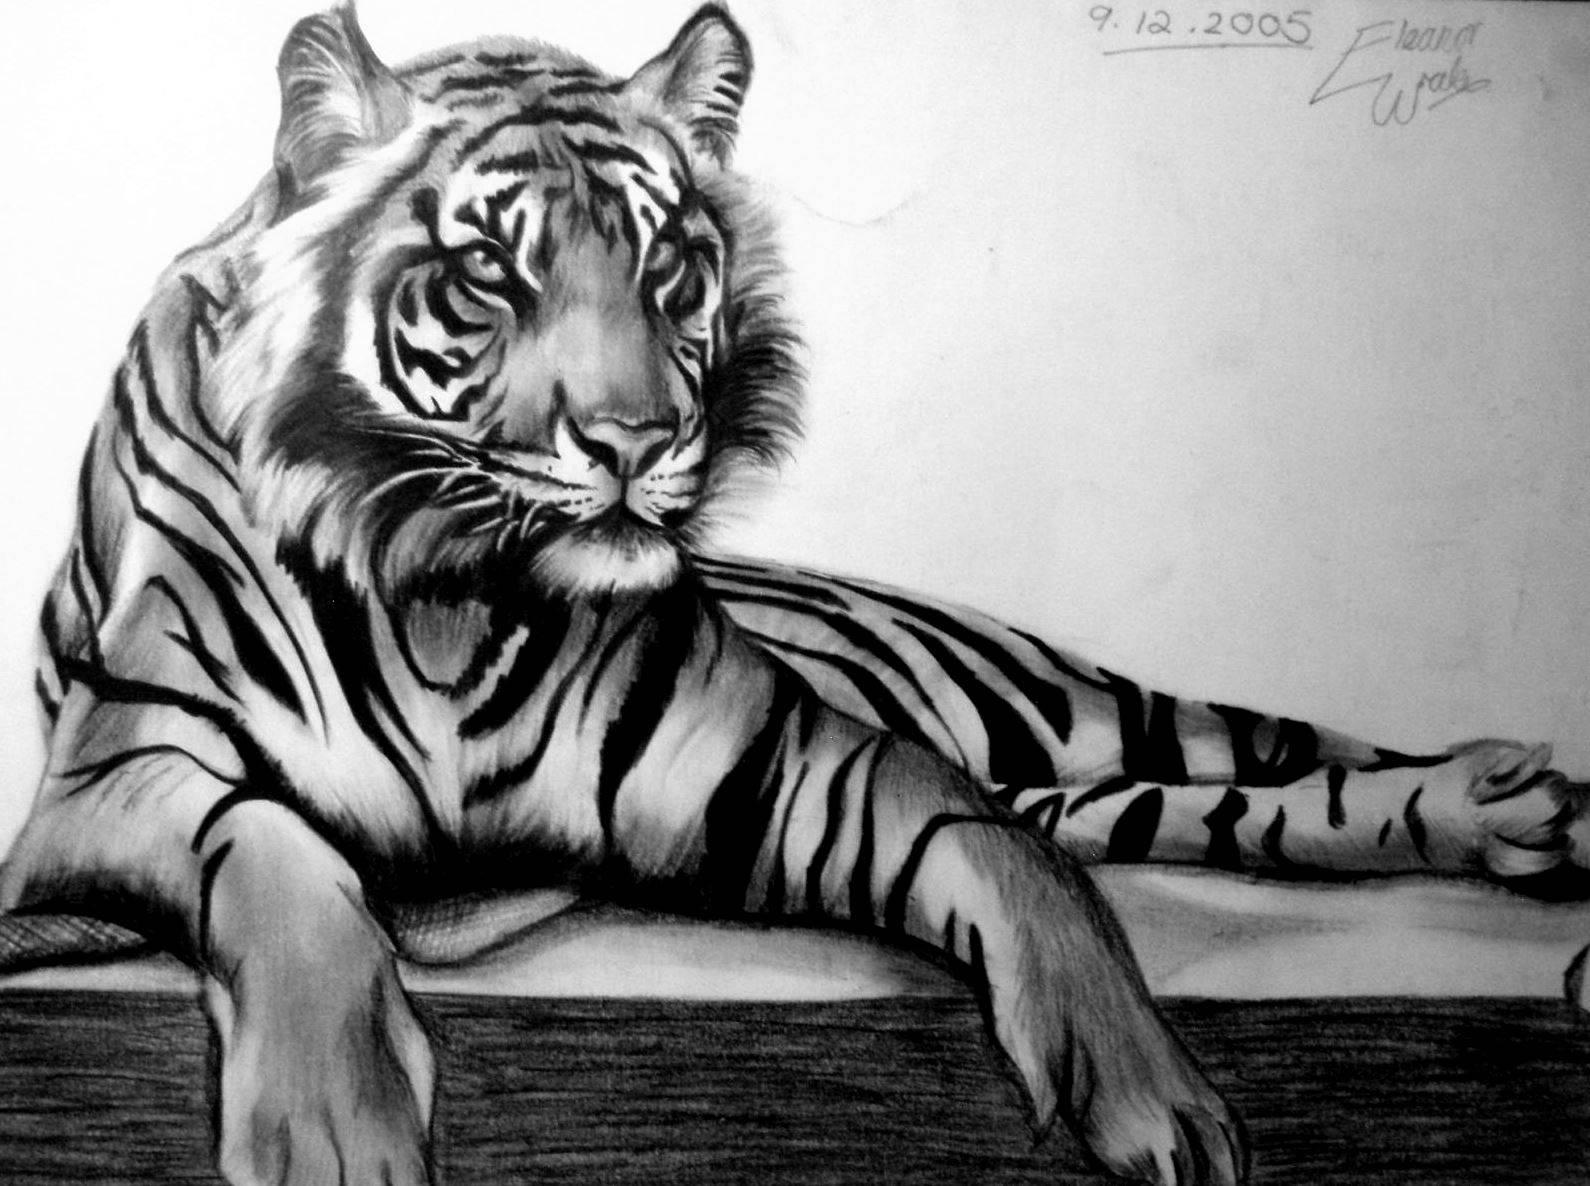 Drawn wallpaper tiger Photo#23 Drawings Cool drawings Tigers